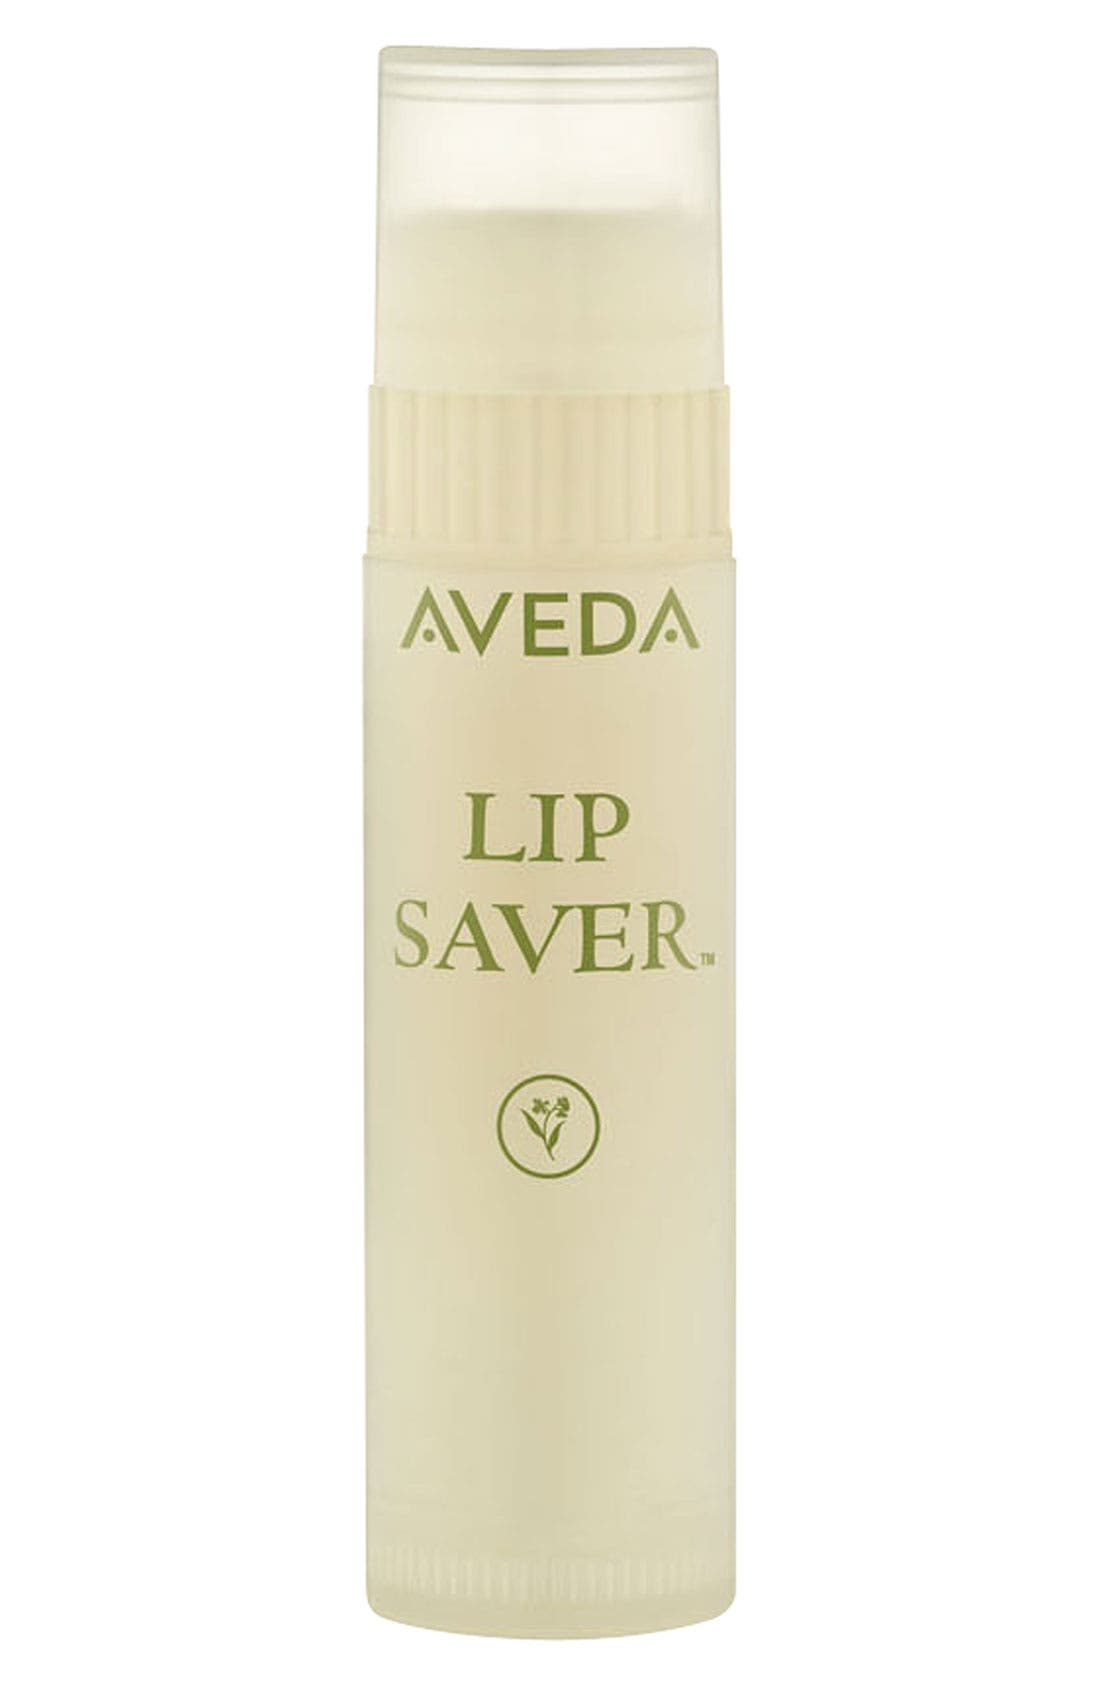 Aveda 'lip saver™' Lip Balm